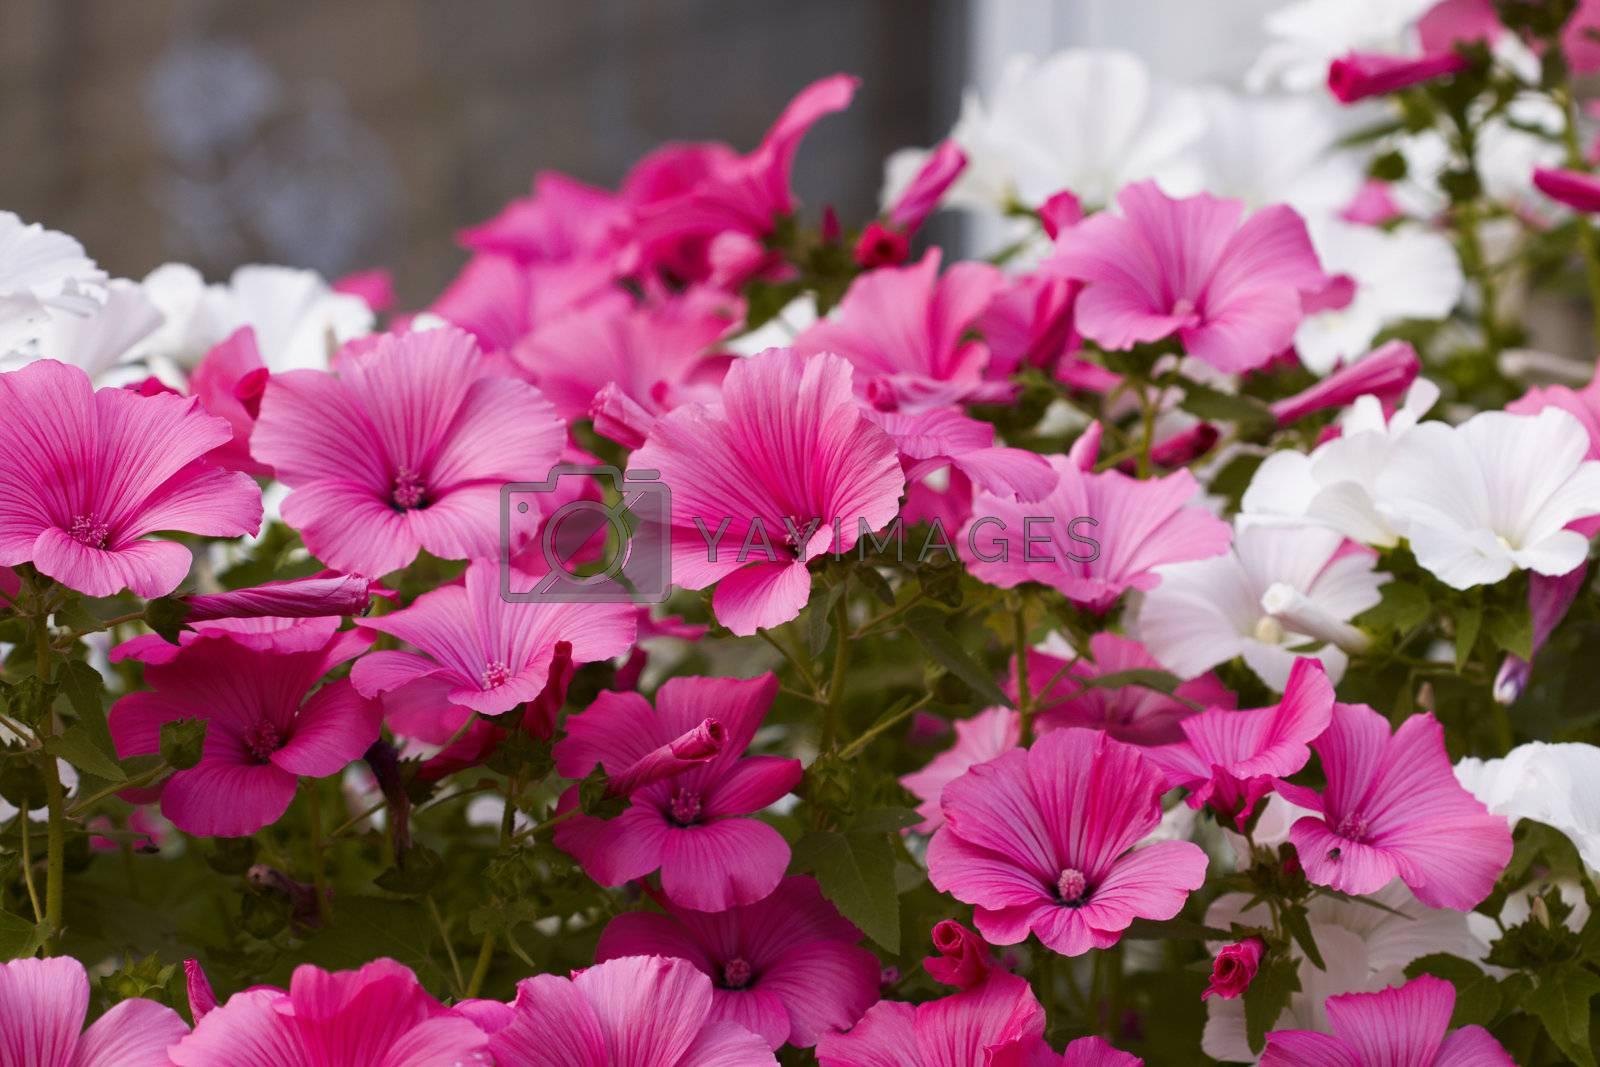 Garden White and Pink flower background. Photo taken August 5th, 2009